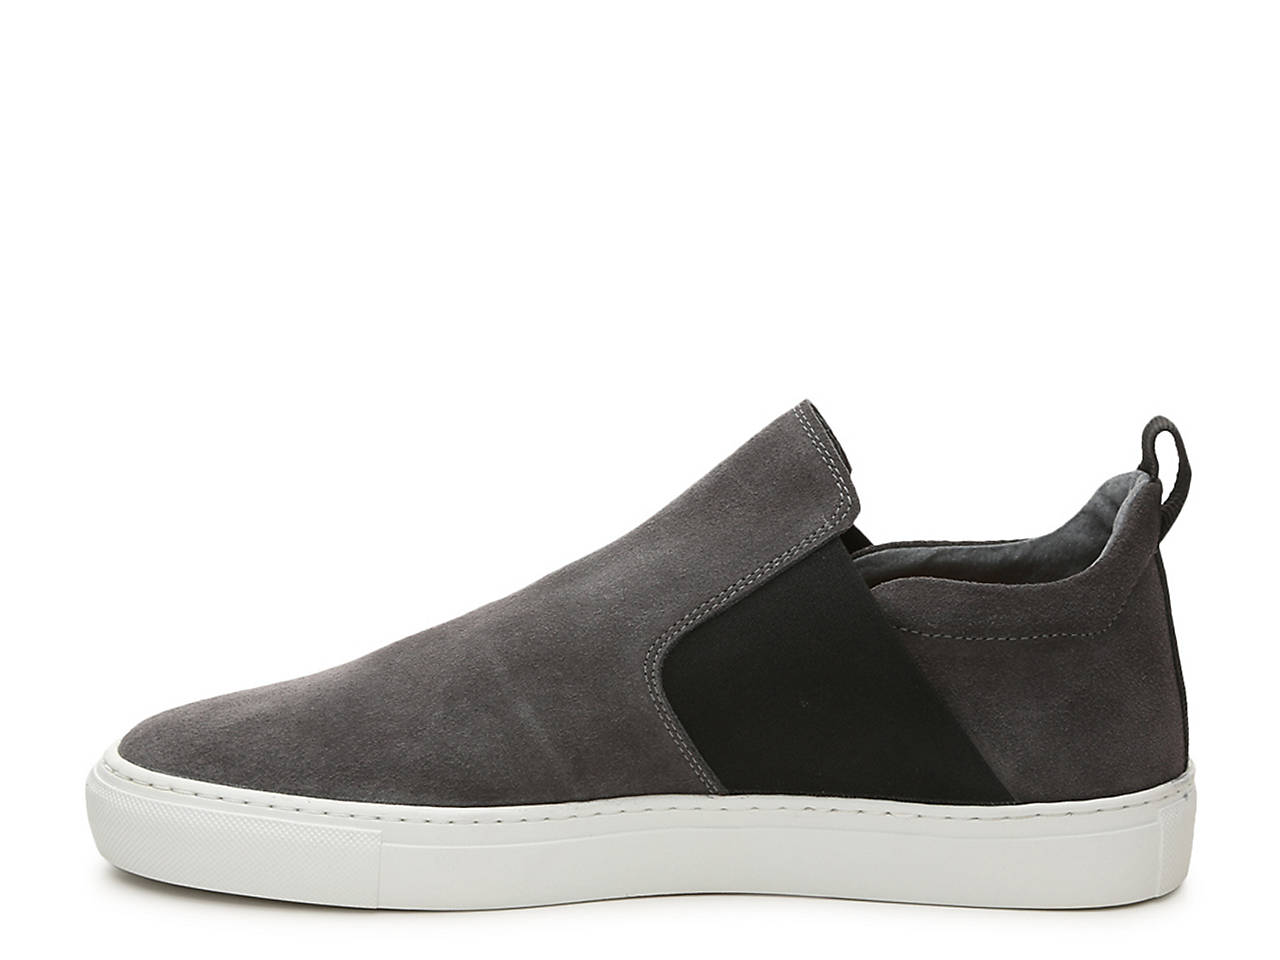 999c51d34ec9e Supply Lab Landon Slip-On Sneaker Men's Shoes | DSW